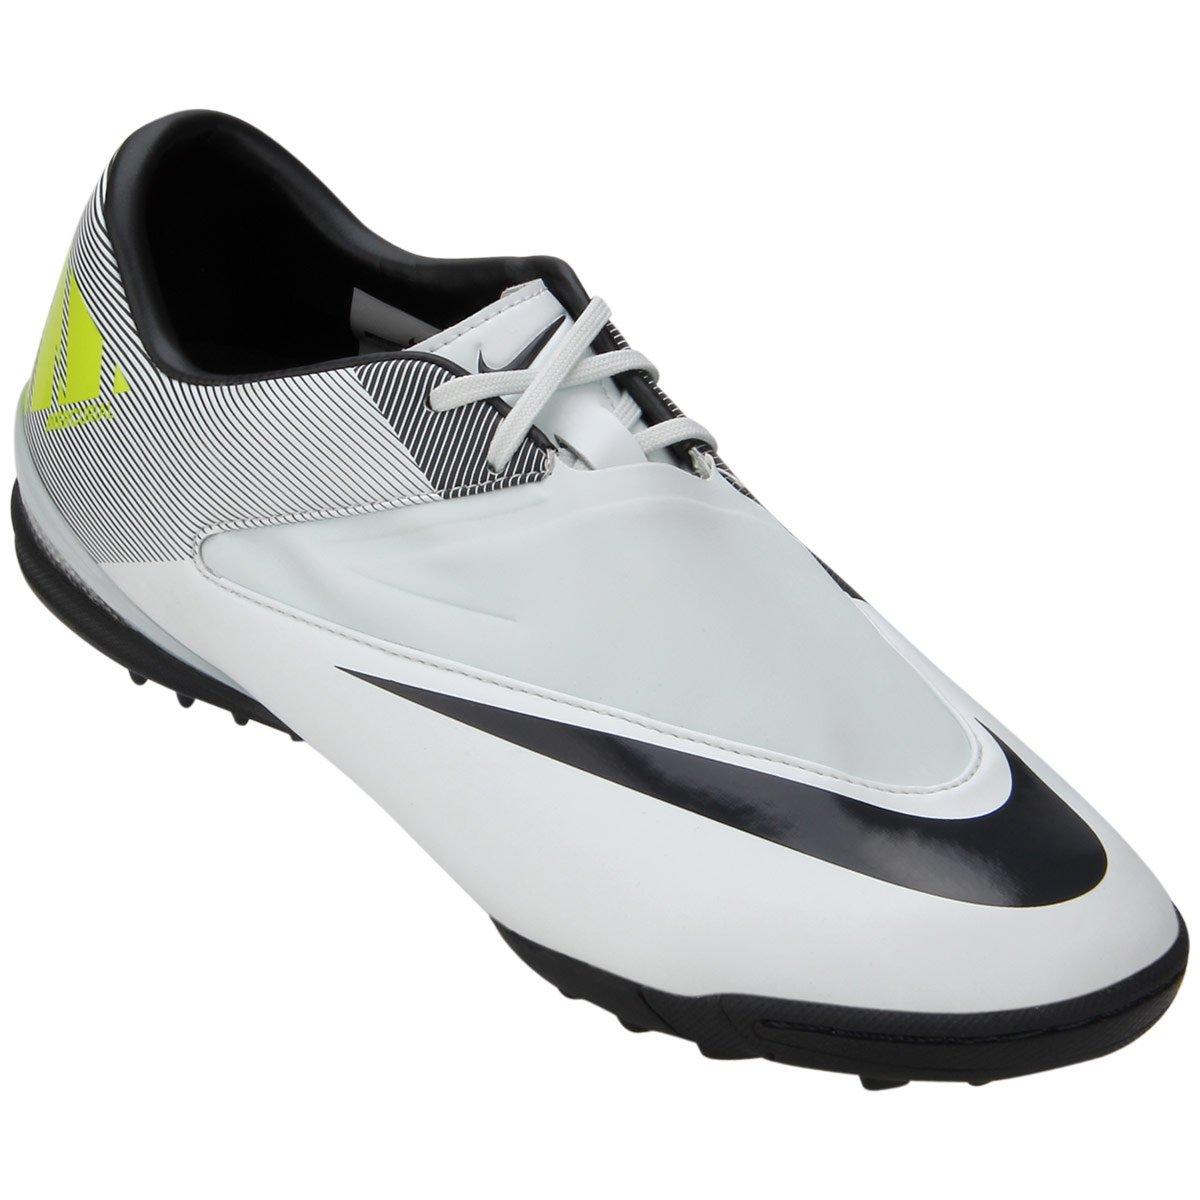 a23f56bdd3 Chuteira Nike Mercurial Glide 2 TF - Compre Agora